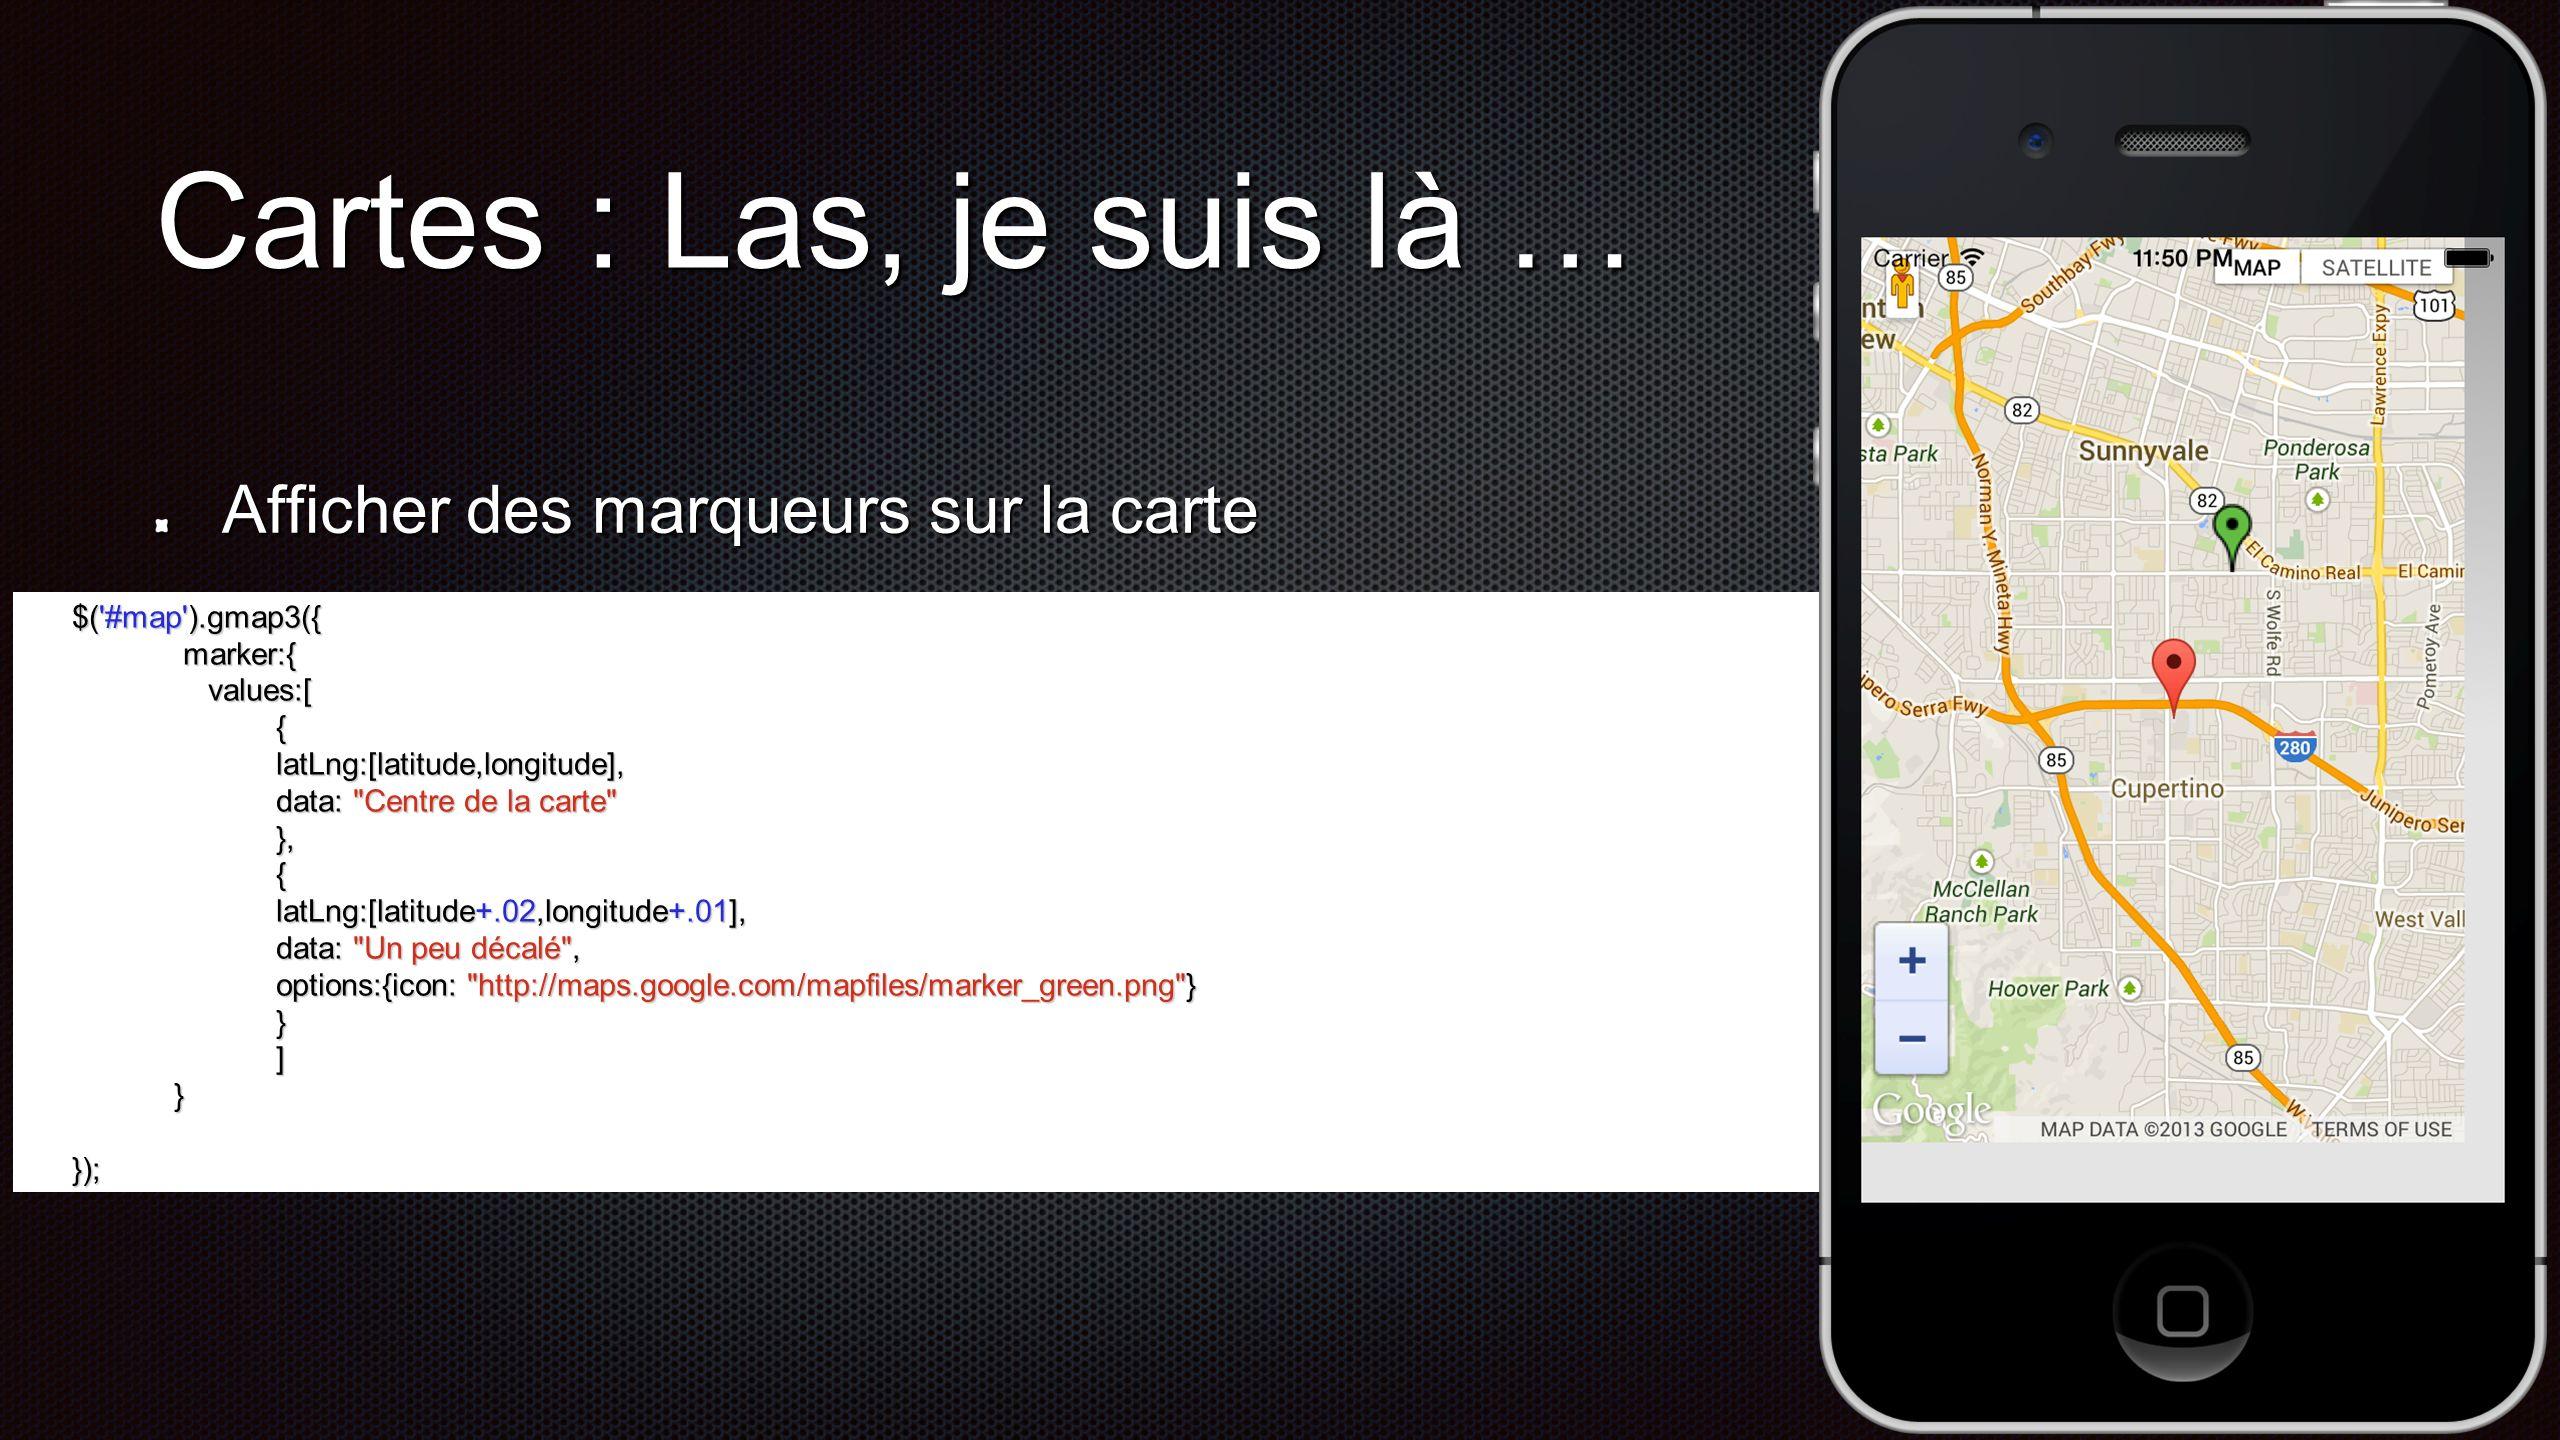 Action si clic $( #map ).gmap3({ $( #map ).gmap3({ marker:{ marker:{ values:[{ values:[{ latLng:[latitude,longitude], latLng:[latitude,longitude], data: Centre de la carte data: Centre de la carte }, … }, … ], ], events: { events: { click: function(marker, event, context){ click: function(marker, event, context){ var map = $(this).gmap3( get ), var map = $(this).gmap3( get ), infowindow = $(this).gmap3({get:{name: infowindow }}); infowindow = $(this).gmap3({get:{name: infowindow }}); if (infowindow){ if (infowindow){ infowindow.open(map, marker); infowindow.open(map, marker); infowindow.setContent(context.data); infowindow.setContent(context.data); } else { } else { $(this).gmap3({ $(this).gmap3({ infowindow:{ infowindow:{ anchor:marker, anchor:marker, options:{content: context.data} options:{content: context.data} } }); }); } } } } Création dune fenêtre Affichage du data